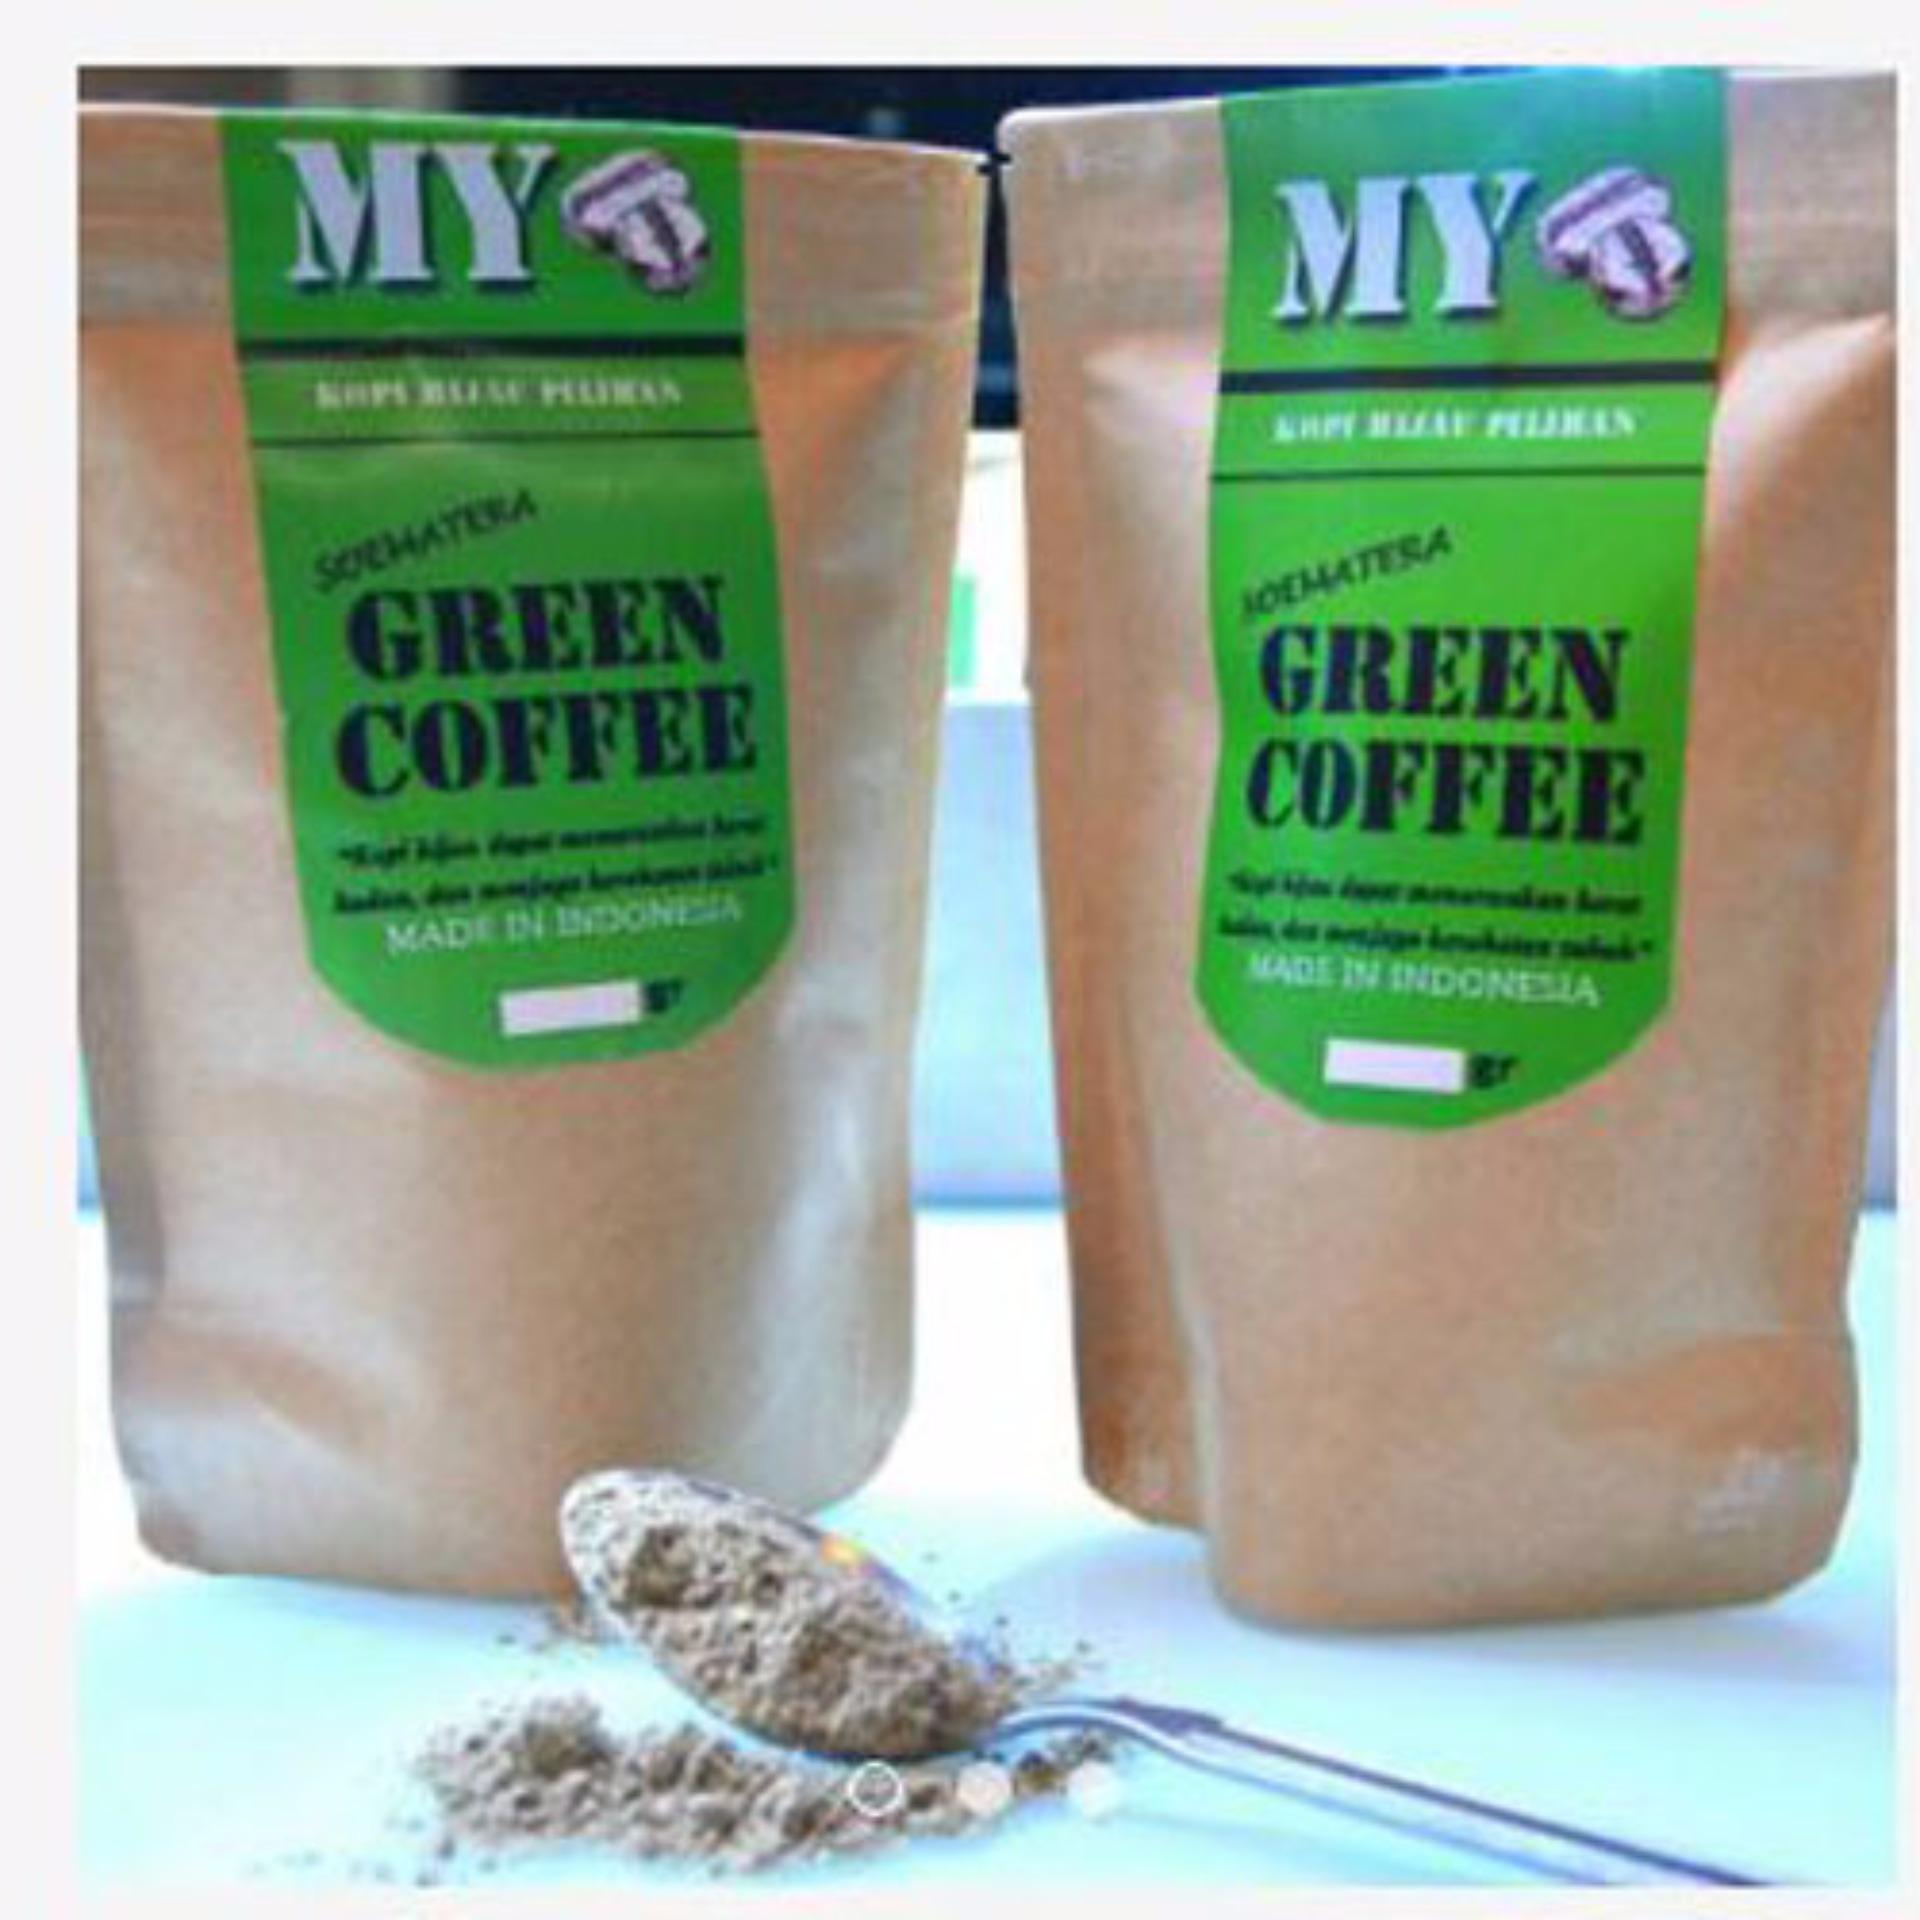 Fry And Roast Kopi Toraja Blend Premium 250 Gram Bubuk Halus Biji Betina Warung Tinggi Blended Coffee Arabica Cek Harga Source Green Coffe Powder